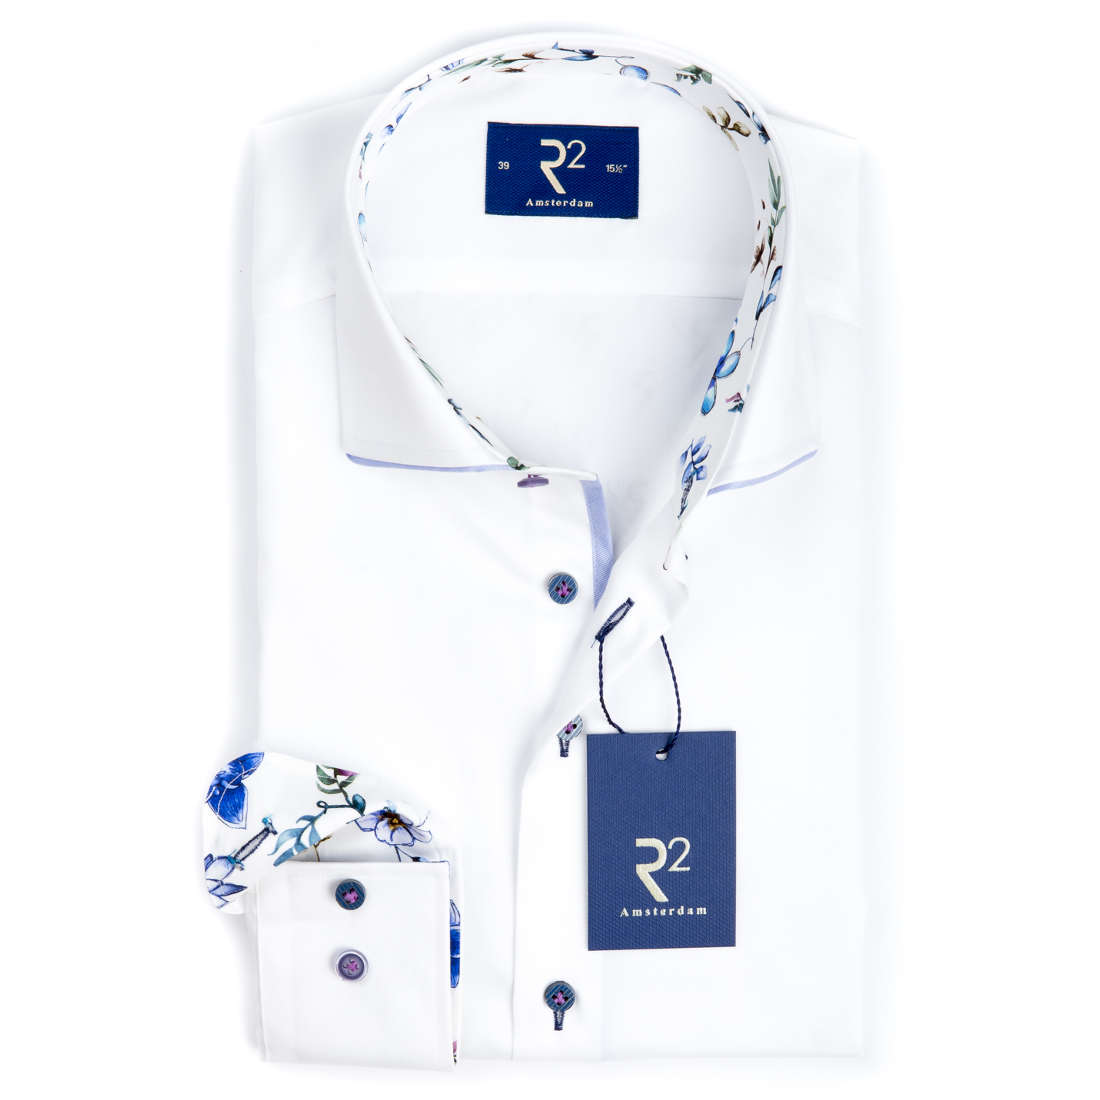 R2 overhemd Modern Fit 104wsp015/004 in het Wit